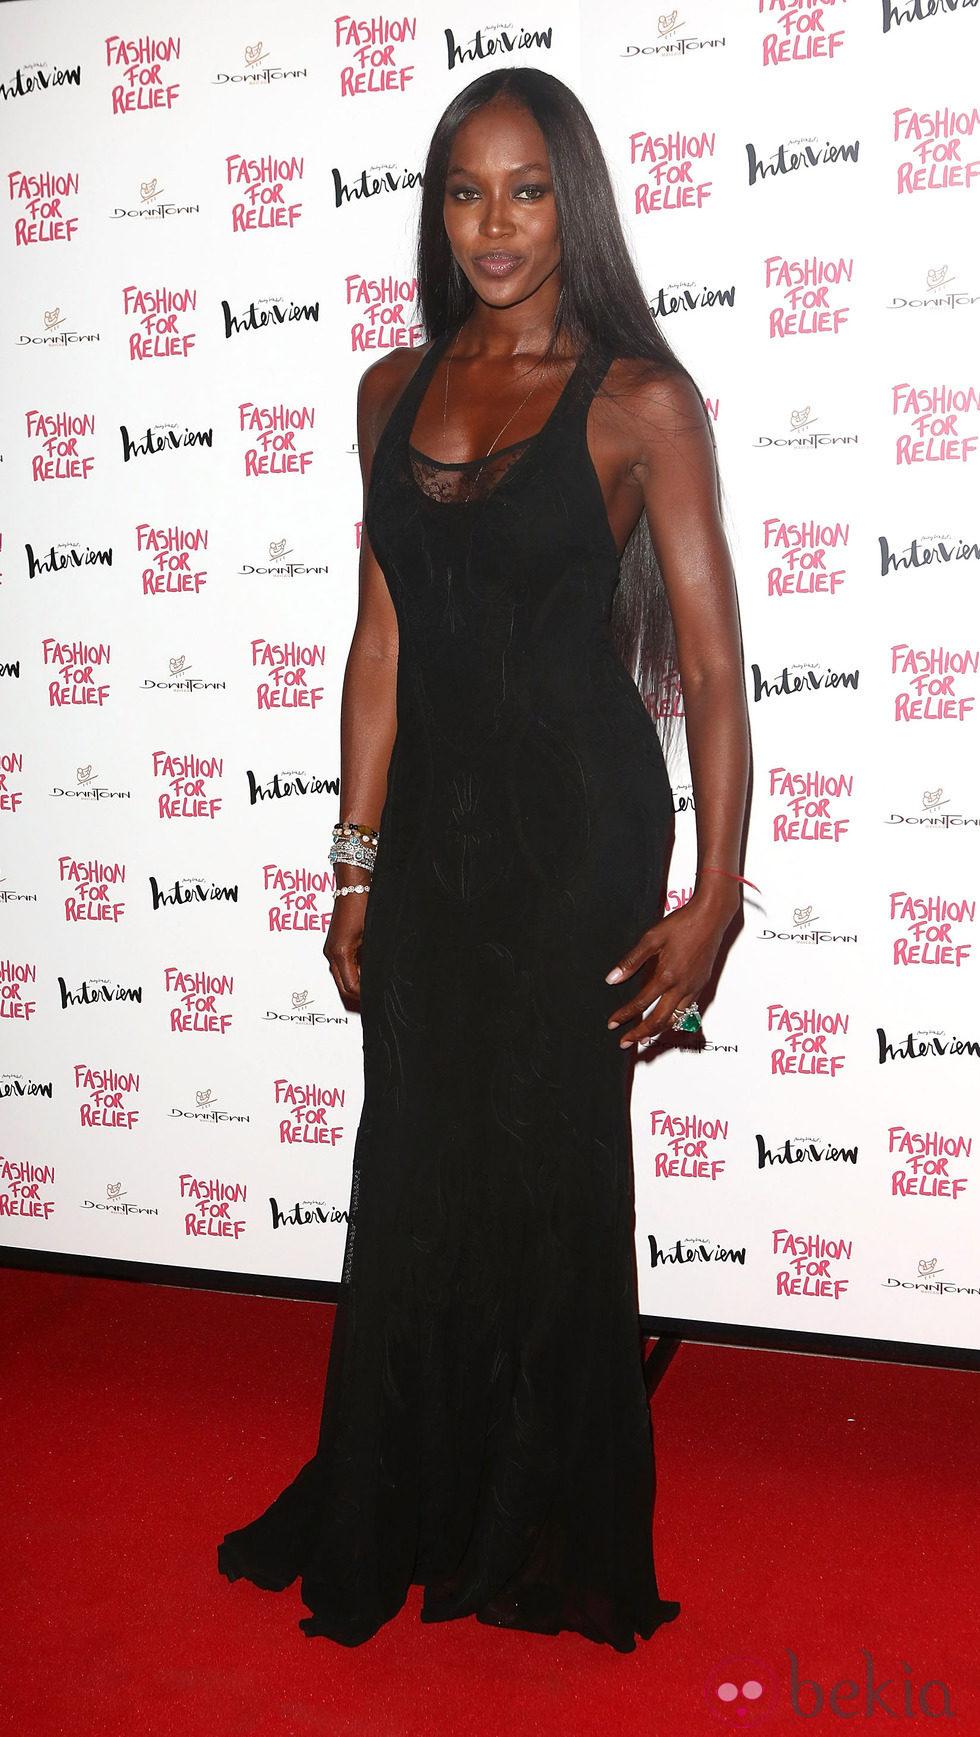 Naomi Campbell en la cena benéfica Fashion for Relief